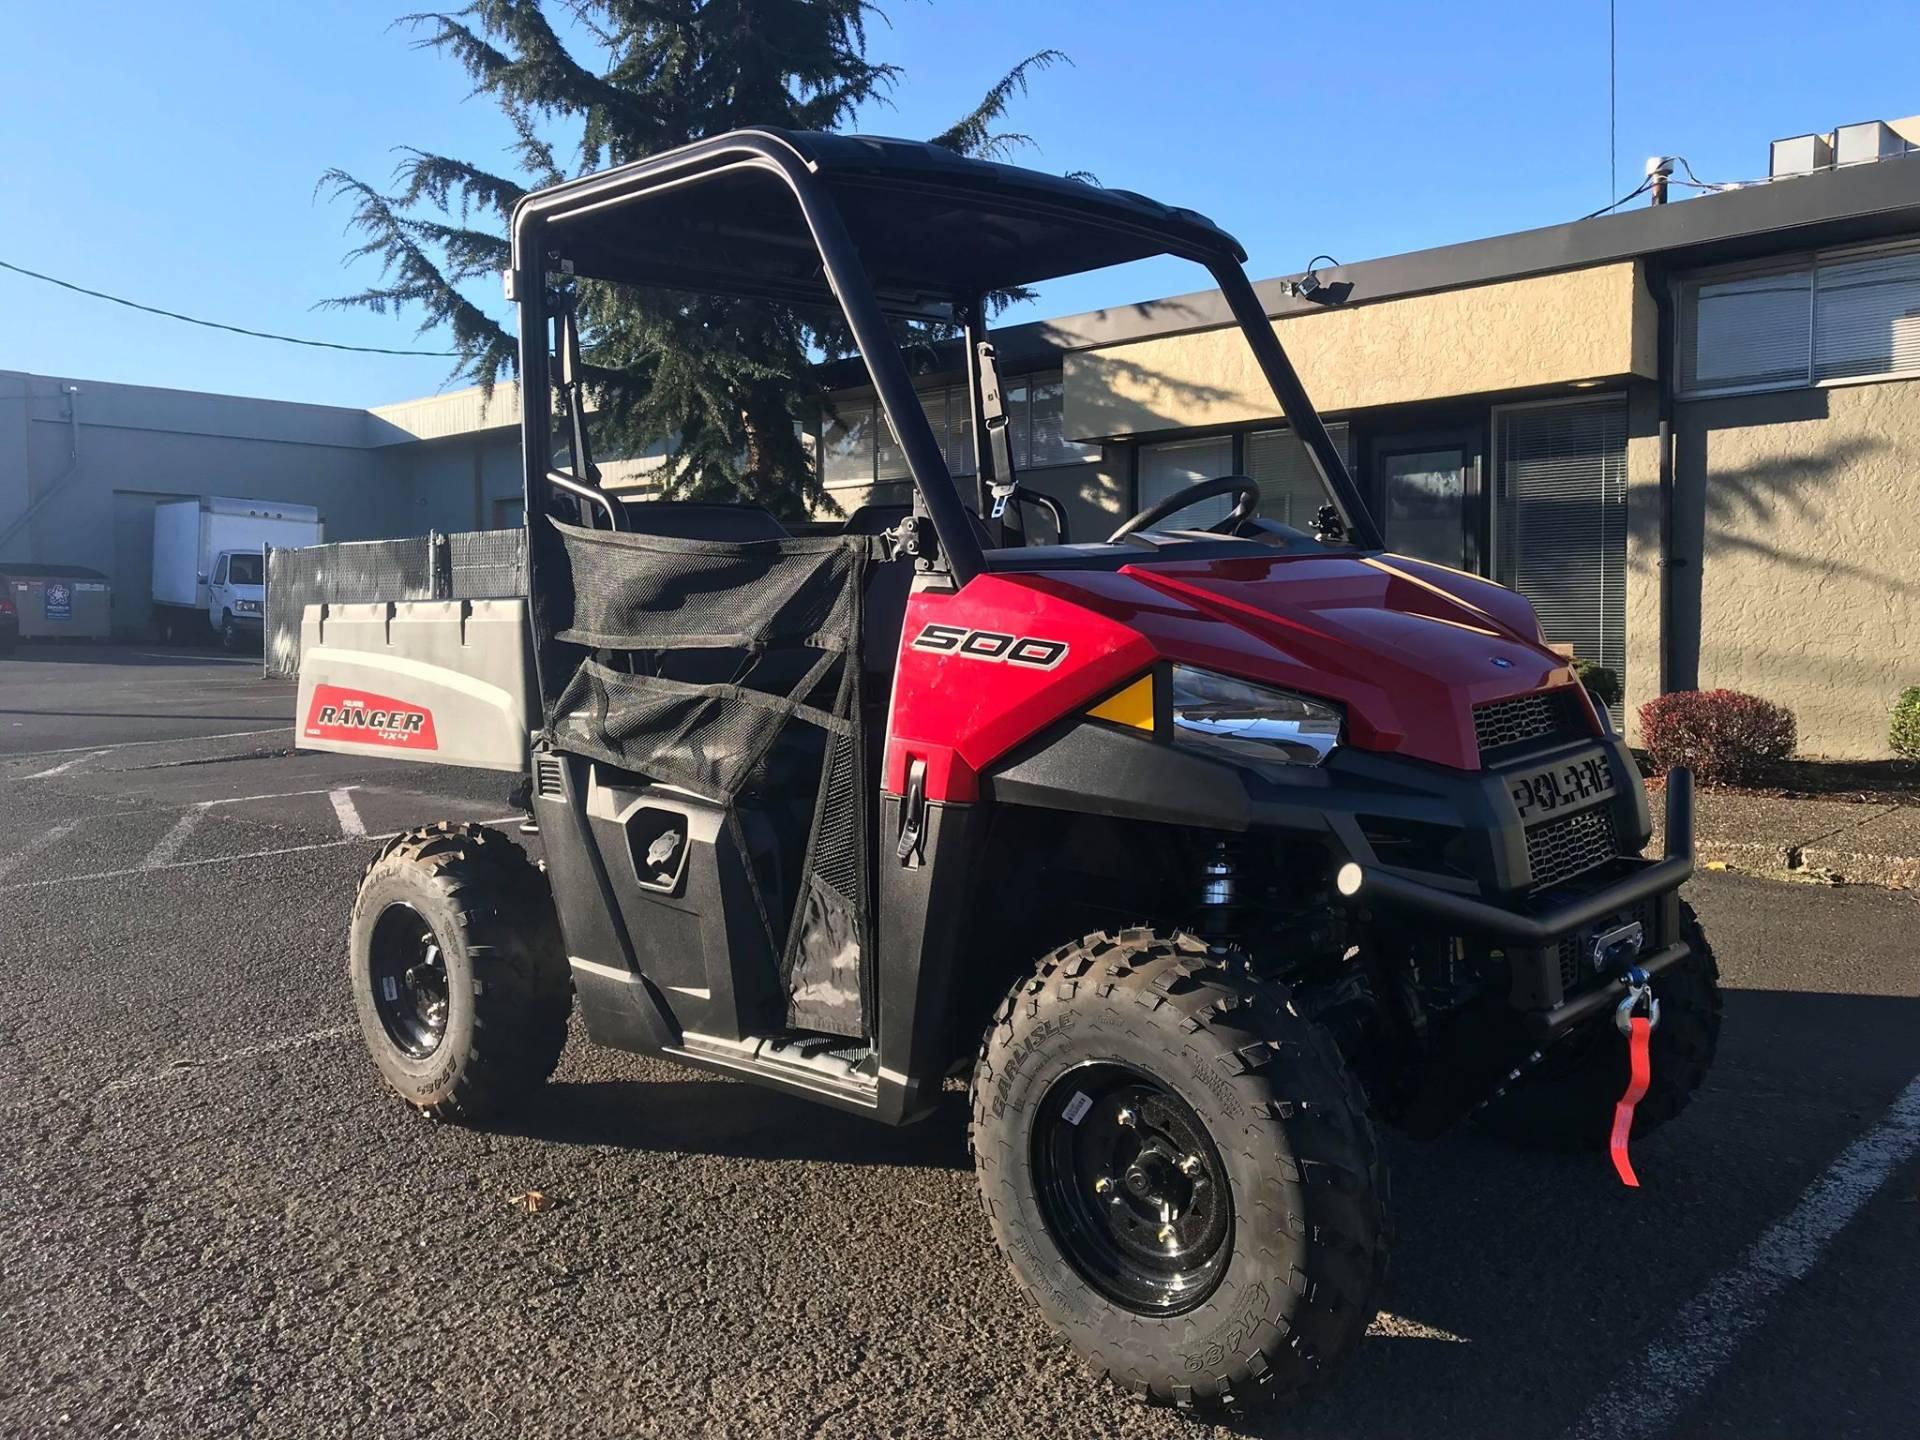 2019 Polaris Ranger 500 for sale 73619